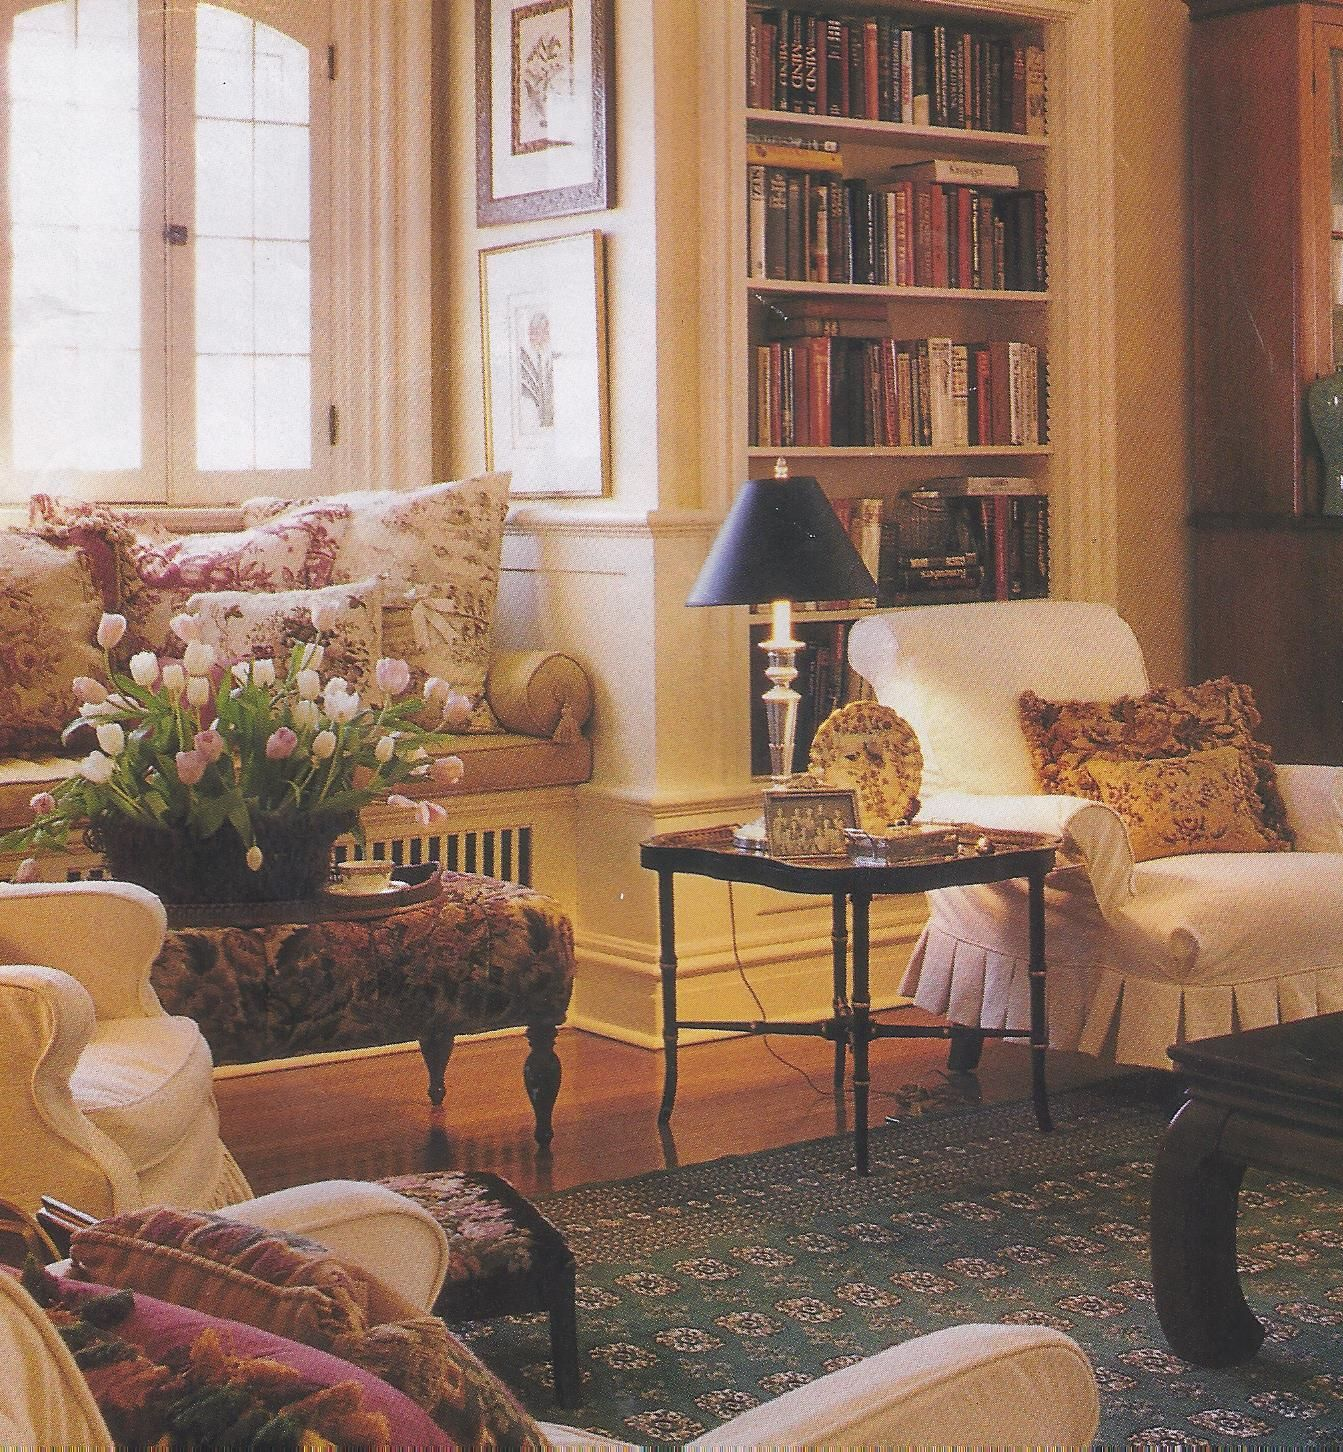 Country Home Decor Magazines: Traditional Decor